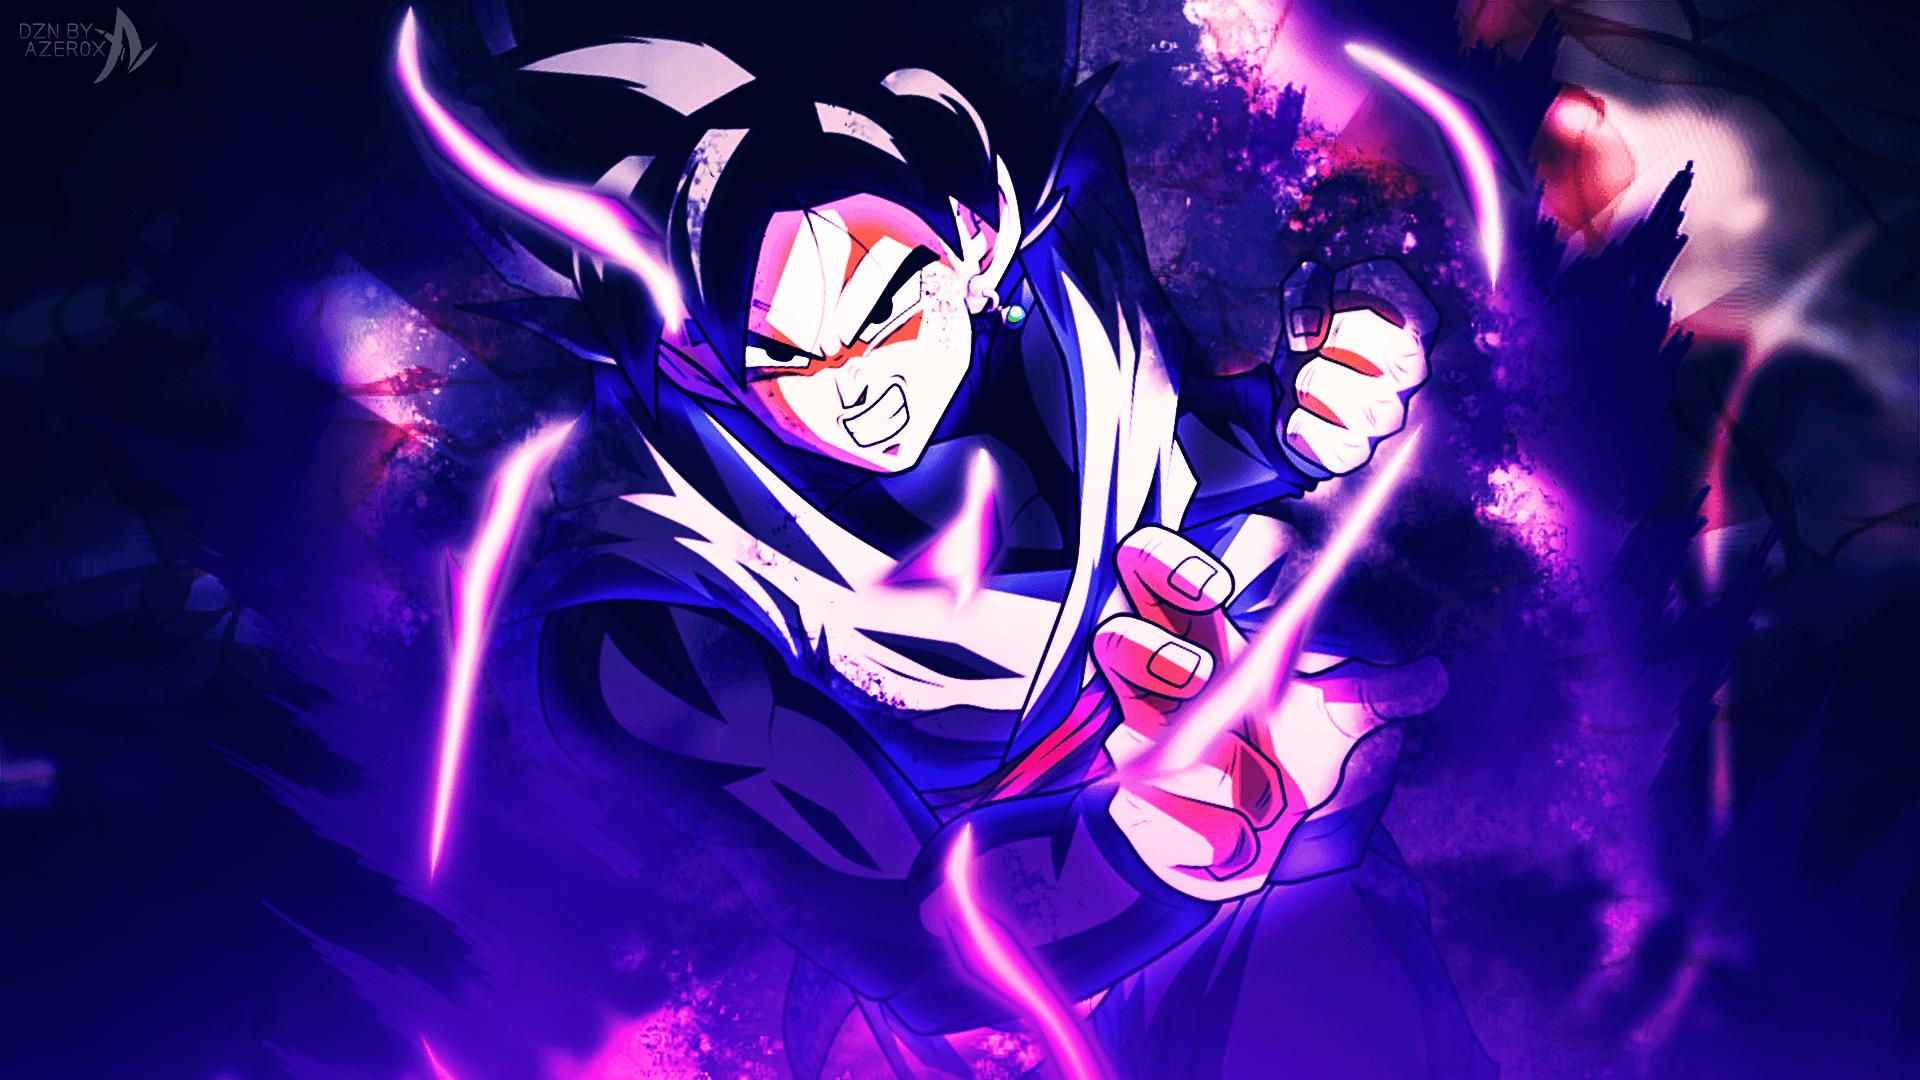 Dark Goku Wallpapers Top Free Dark Goku Backgrounds Wallpaperaccess